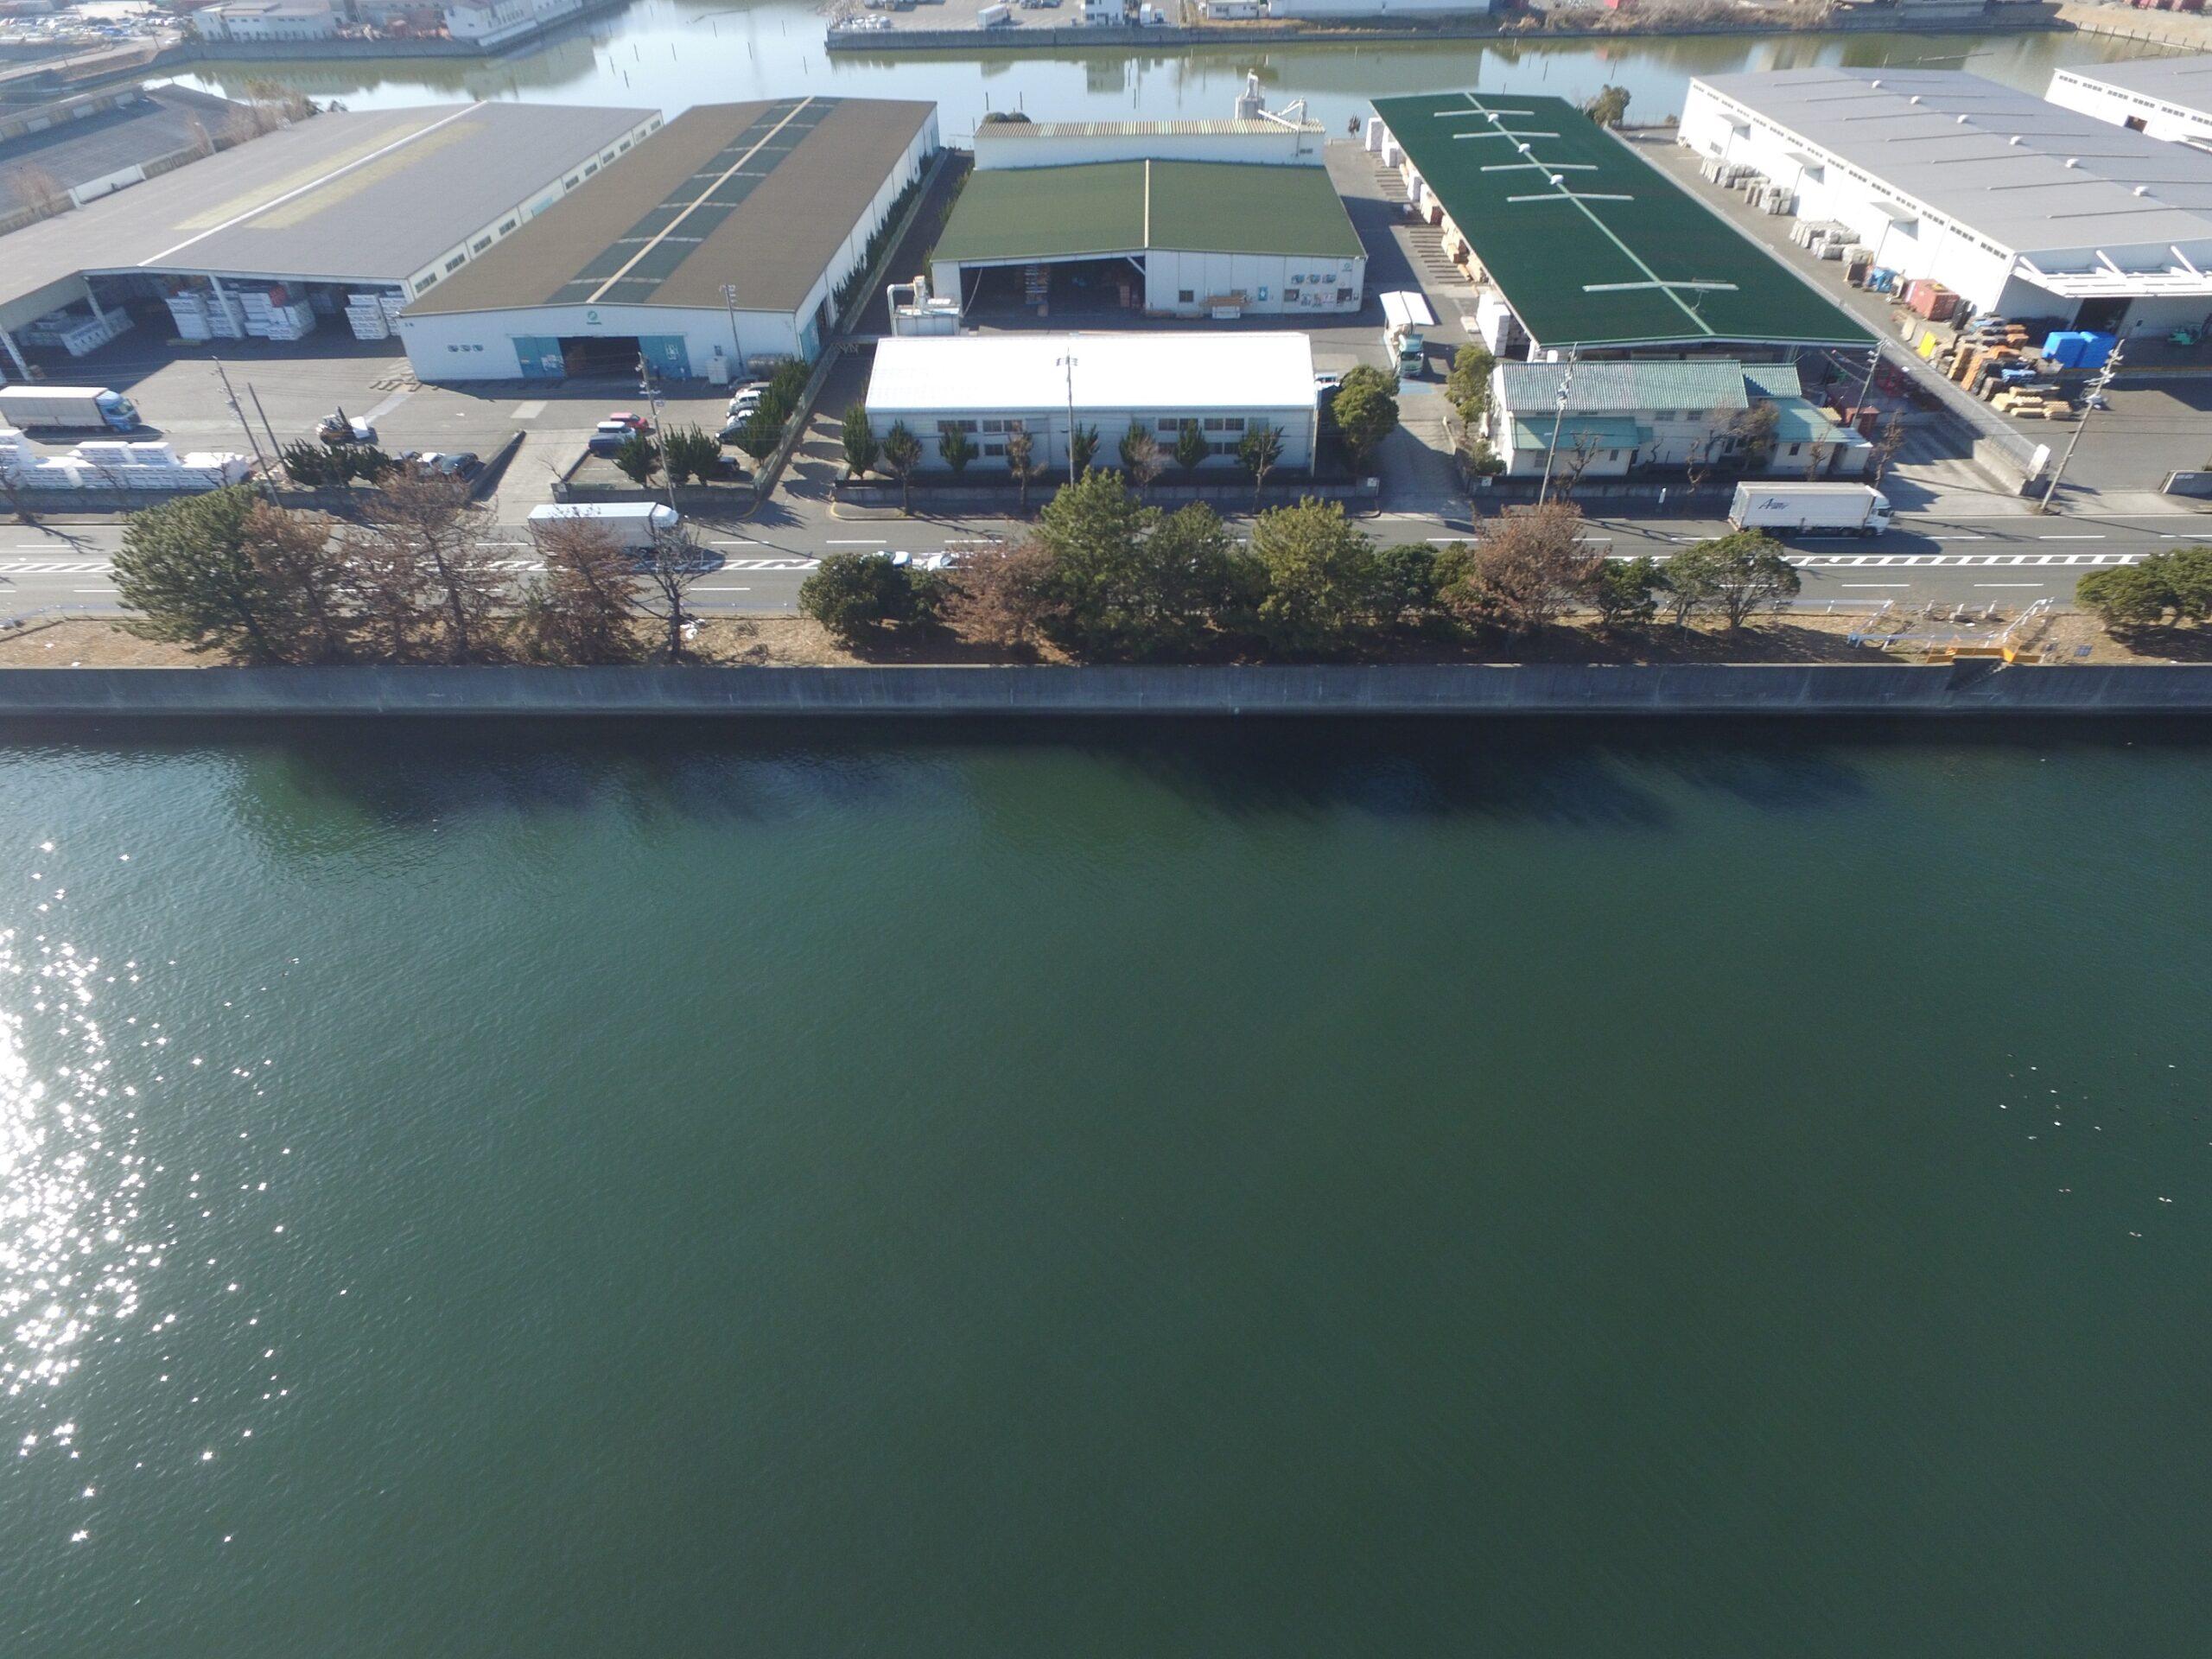 海部建設株式会社の港湾工事(弥富ふ頭第1貯木場北側地盤改良工事(その1))